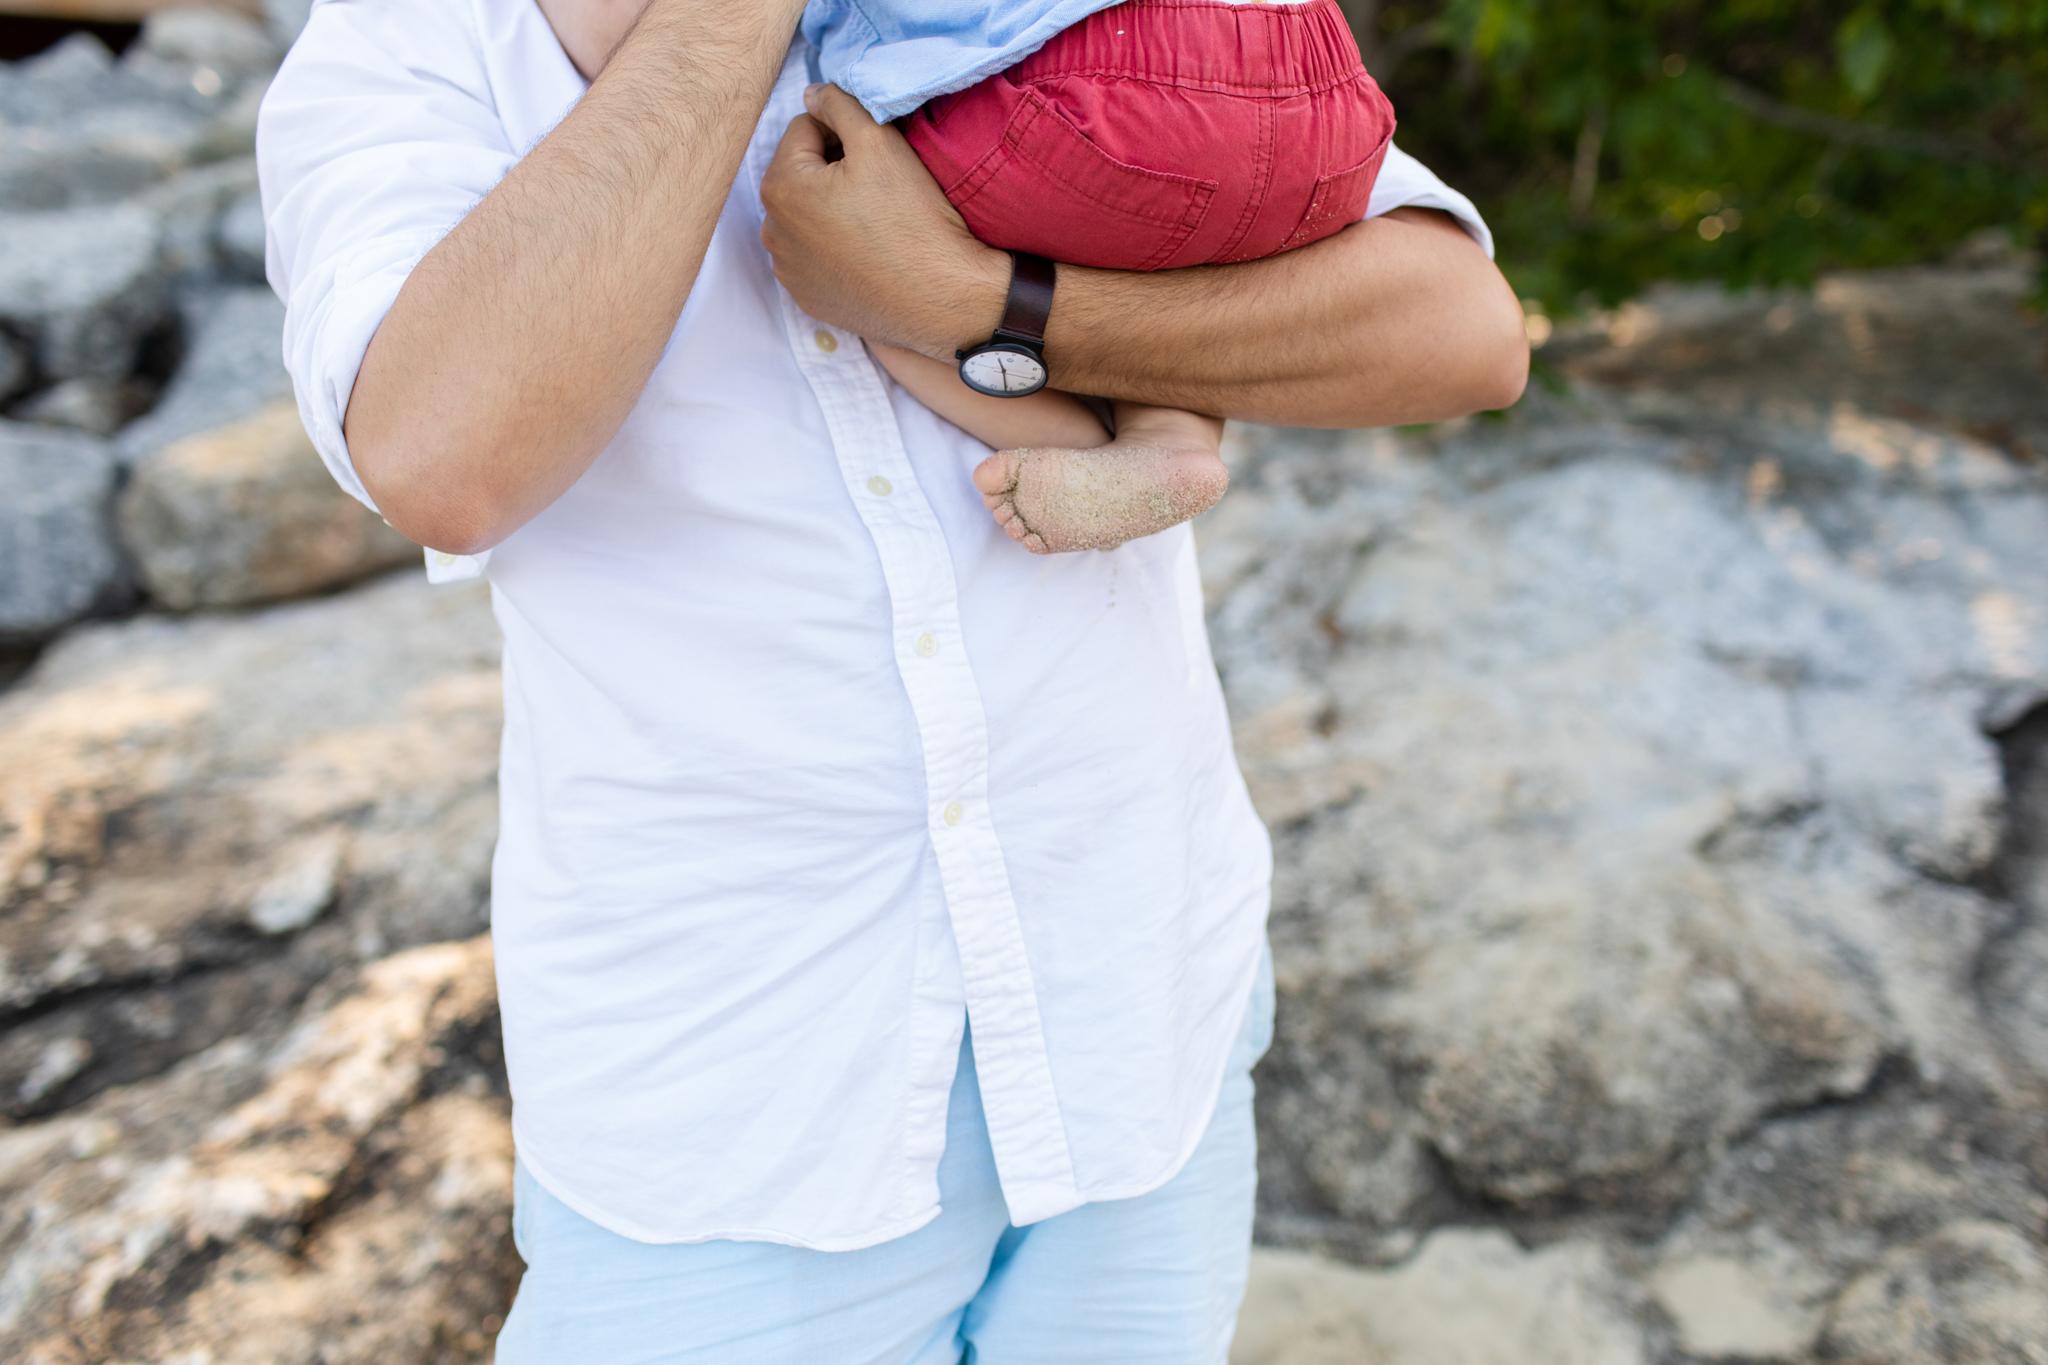 maine-family-baby-photographer-stepheney-collins -61.jpg